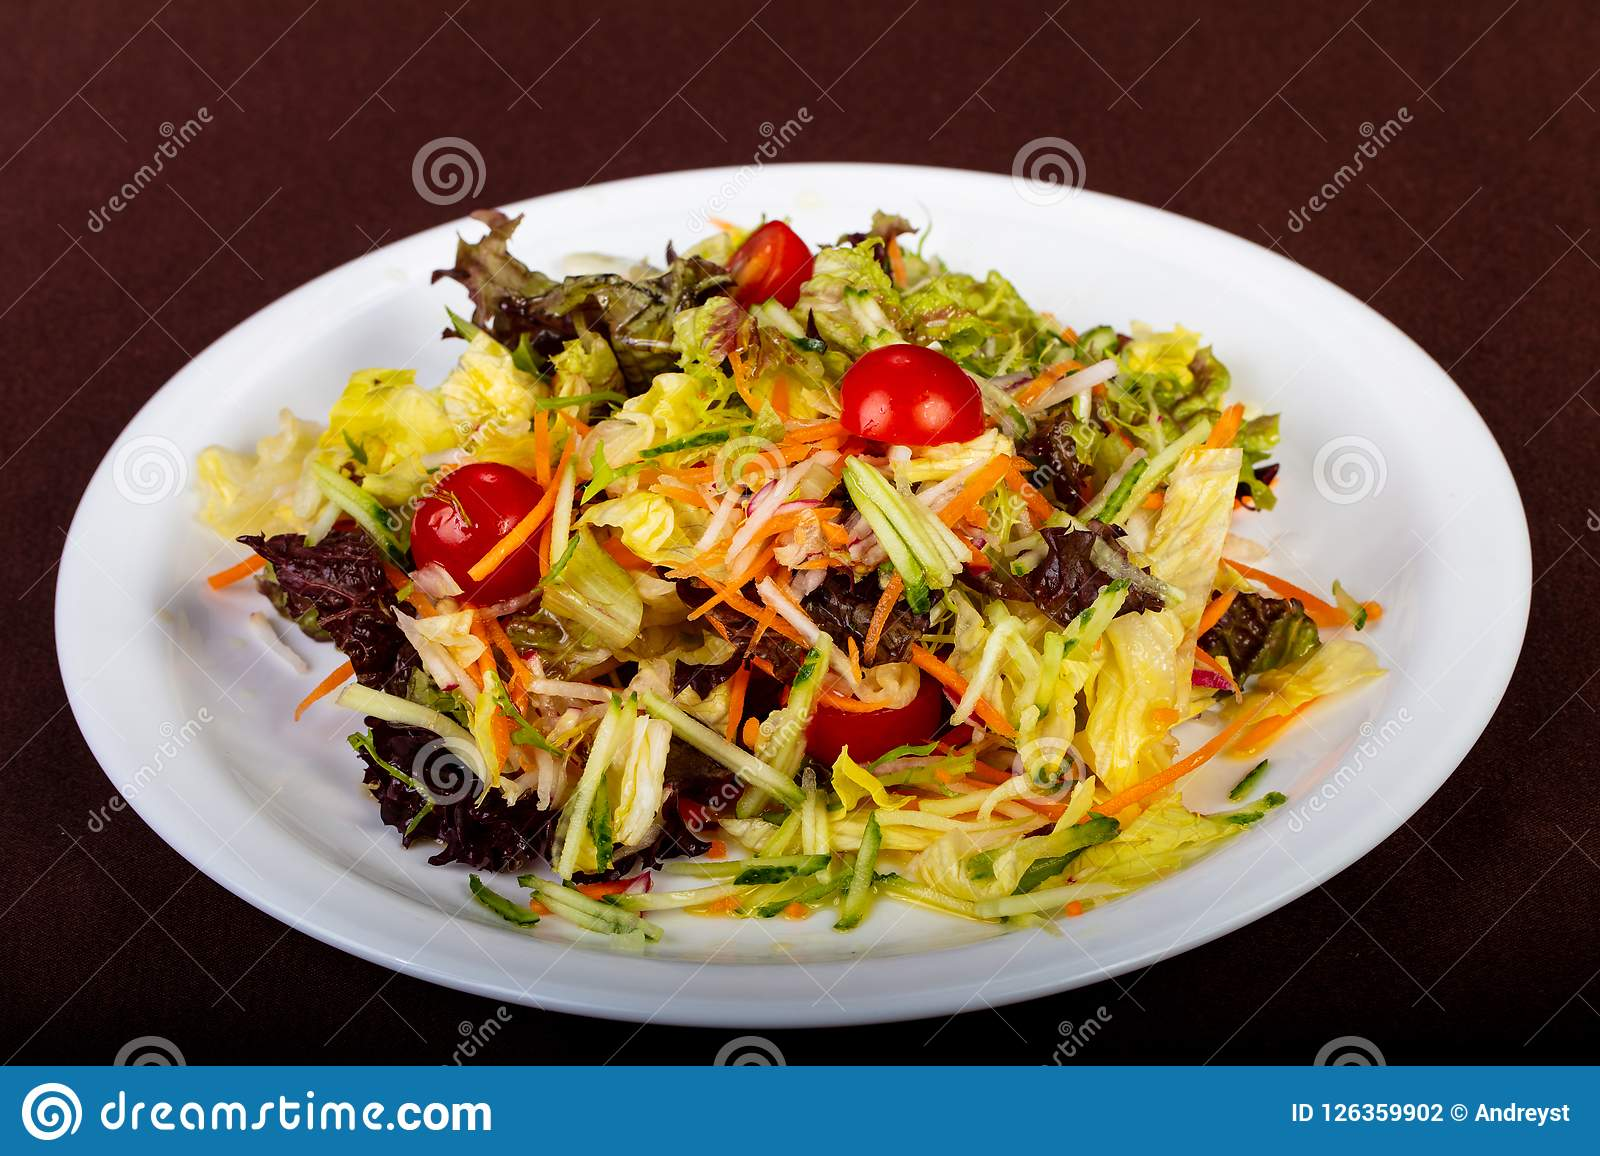 Dietary vegan salad